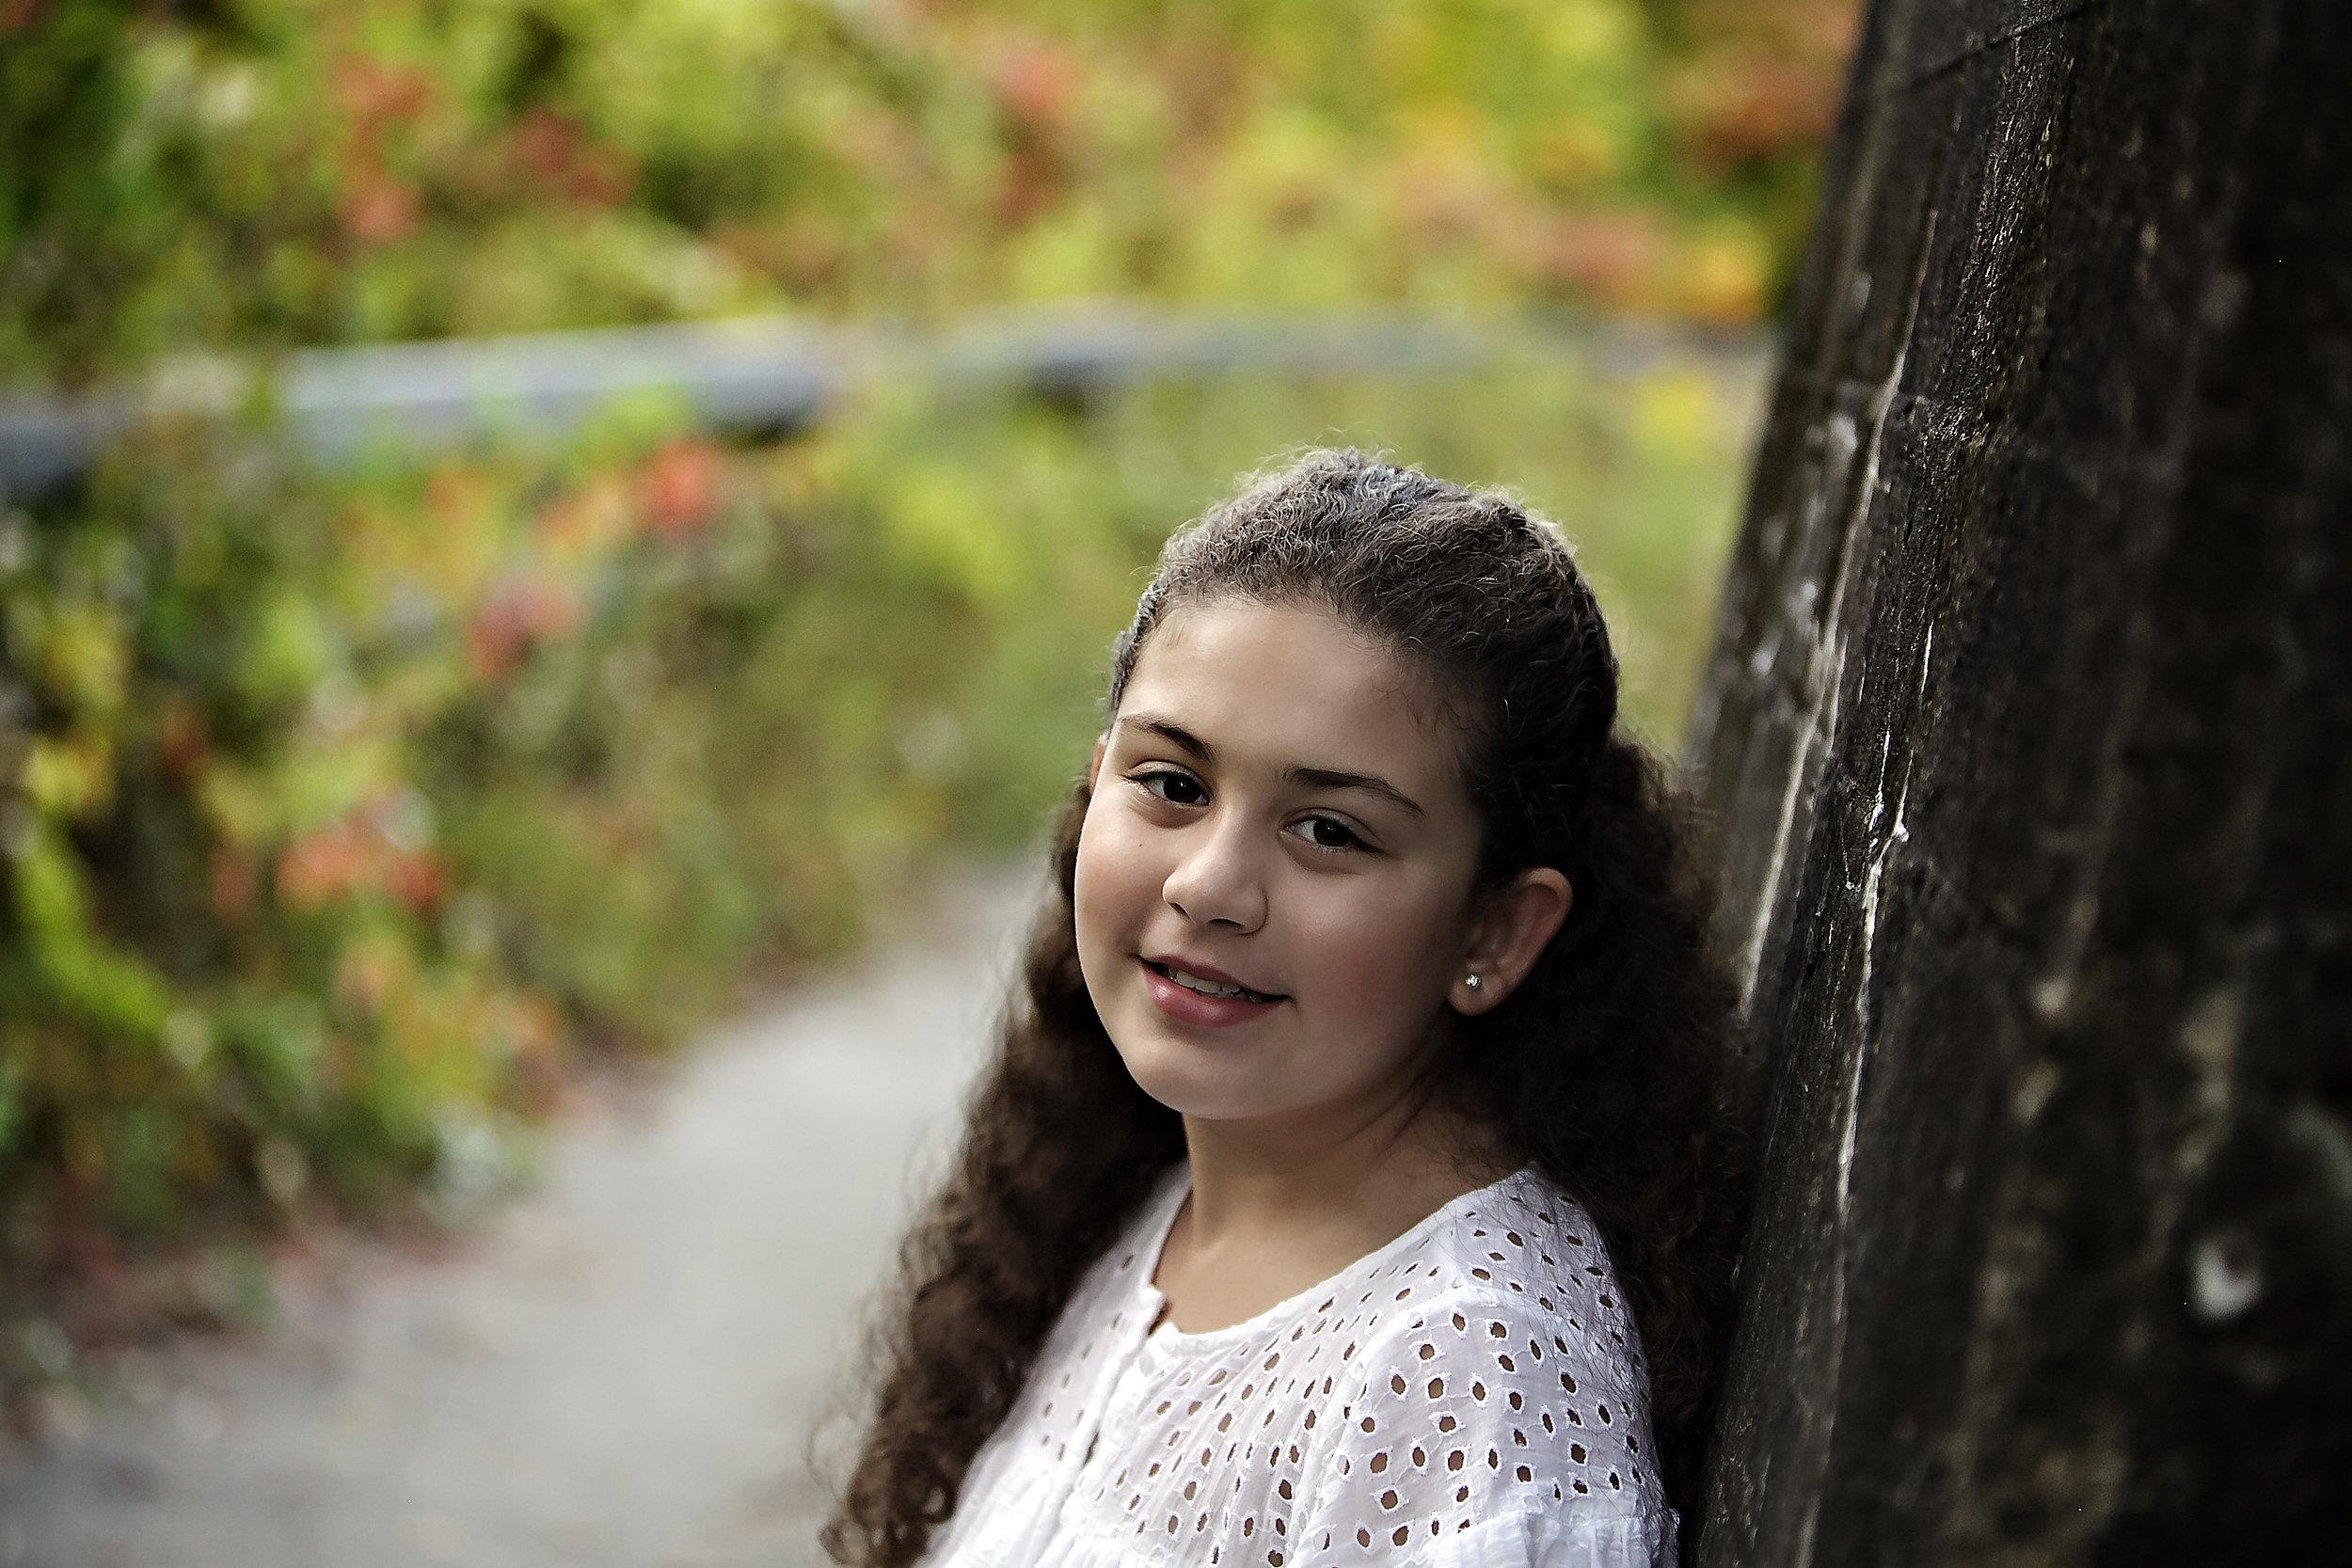 Oshawa_Child_Portrait_Photographer_Petra_King_Photography